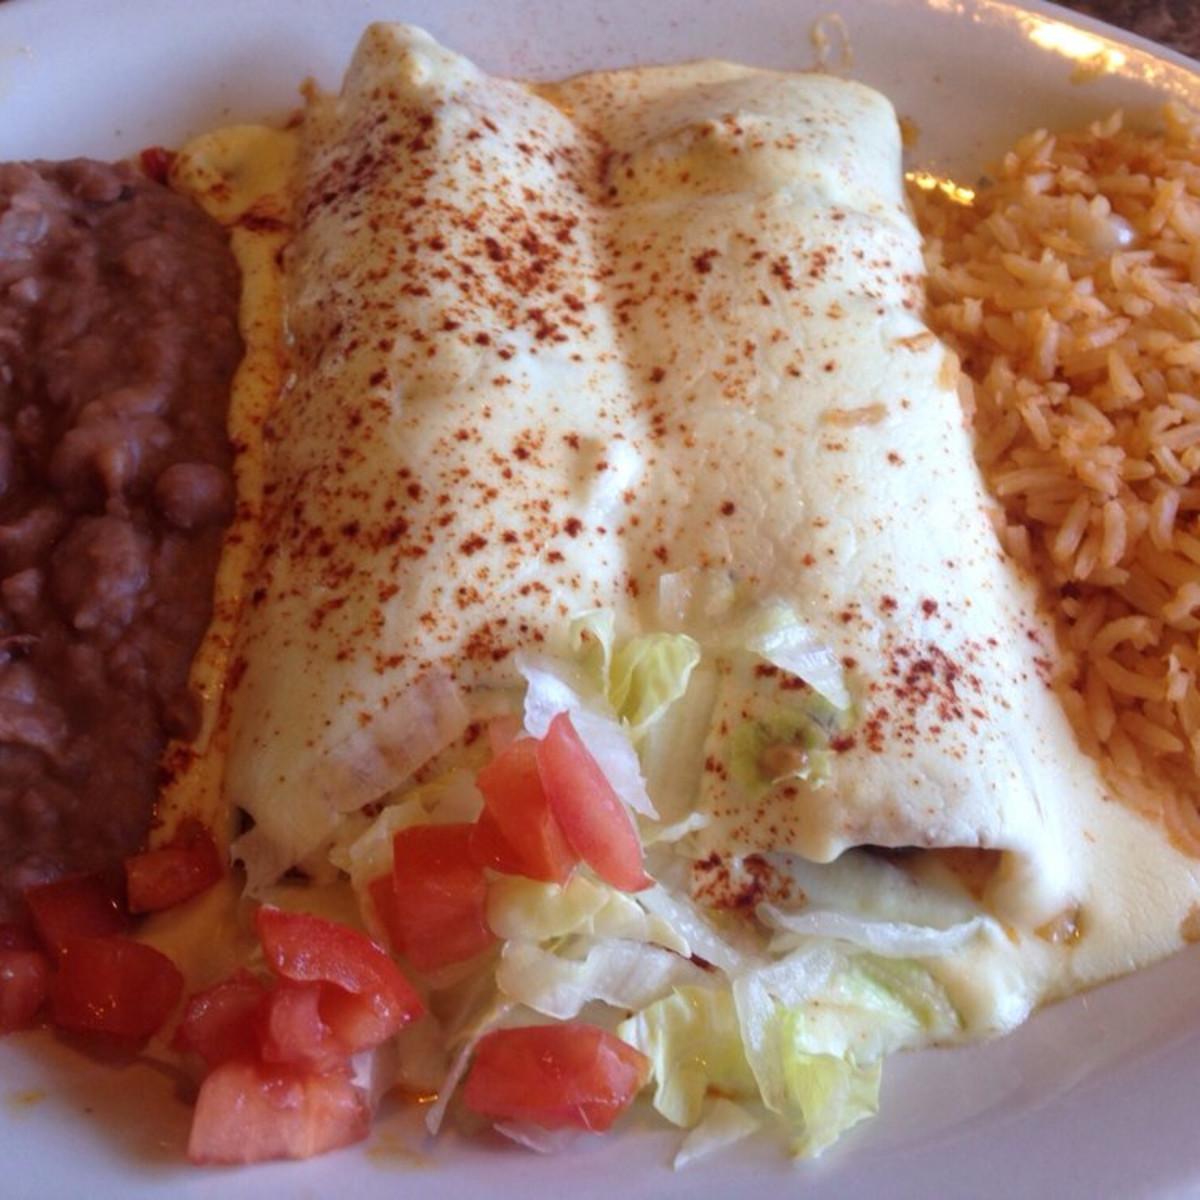 Pulido's enchiladas